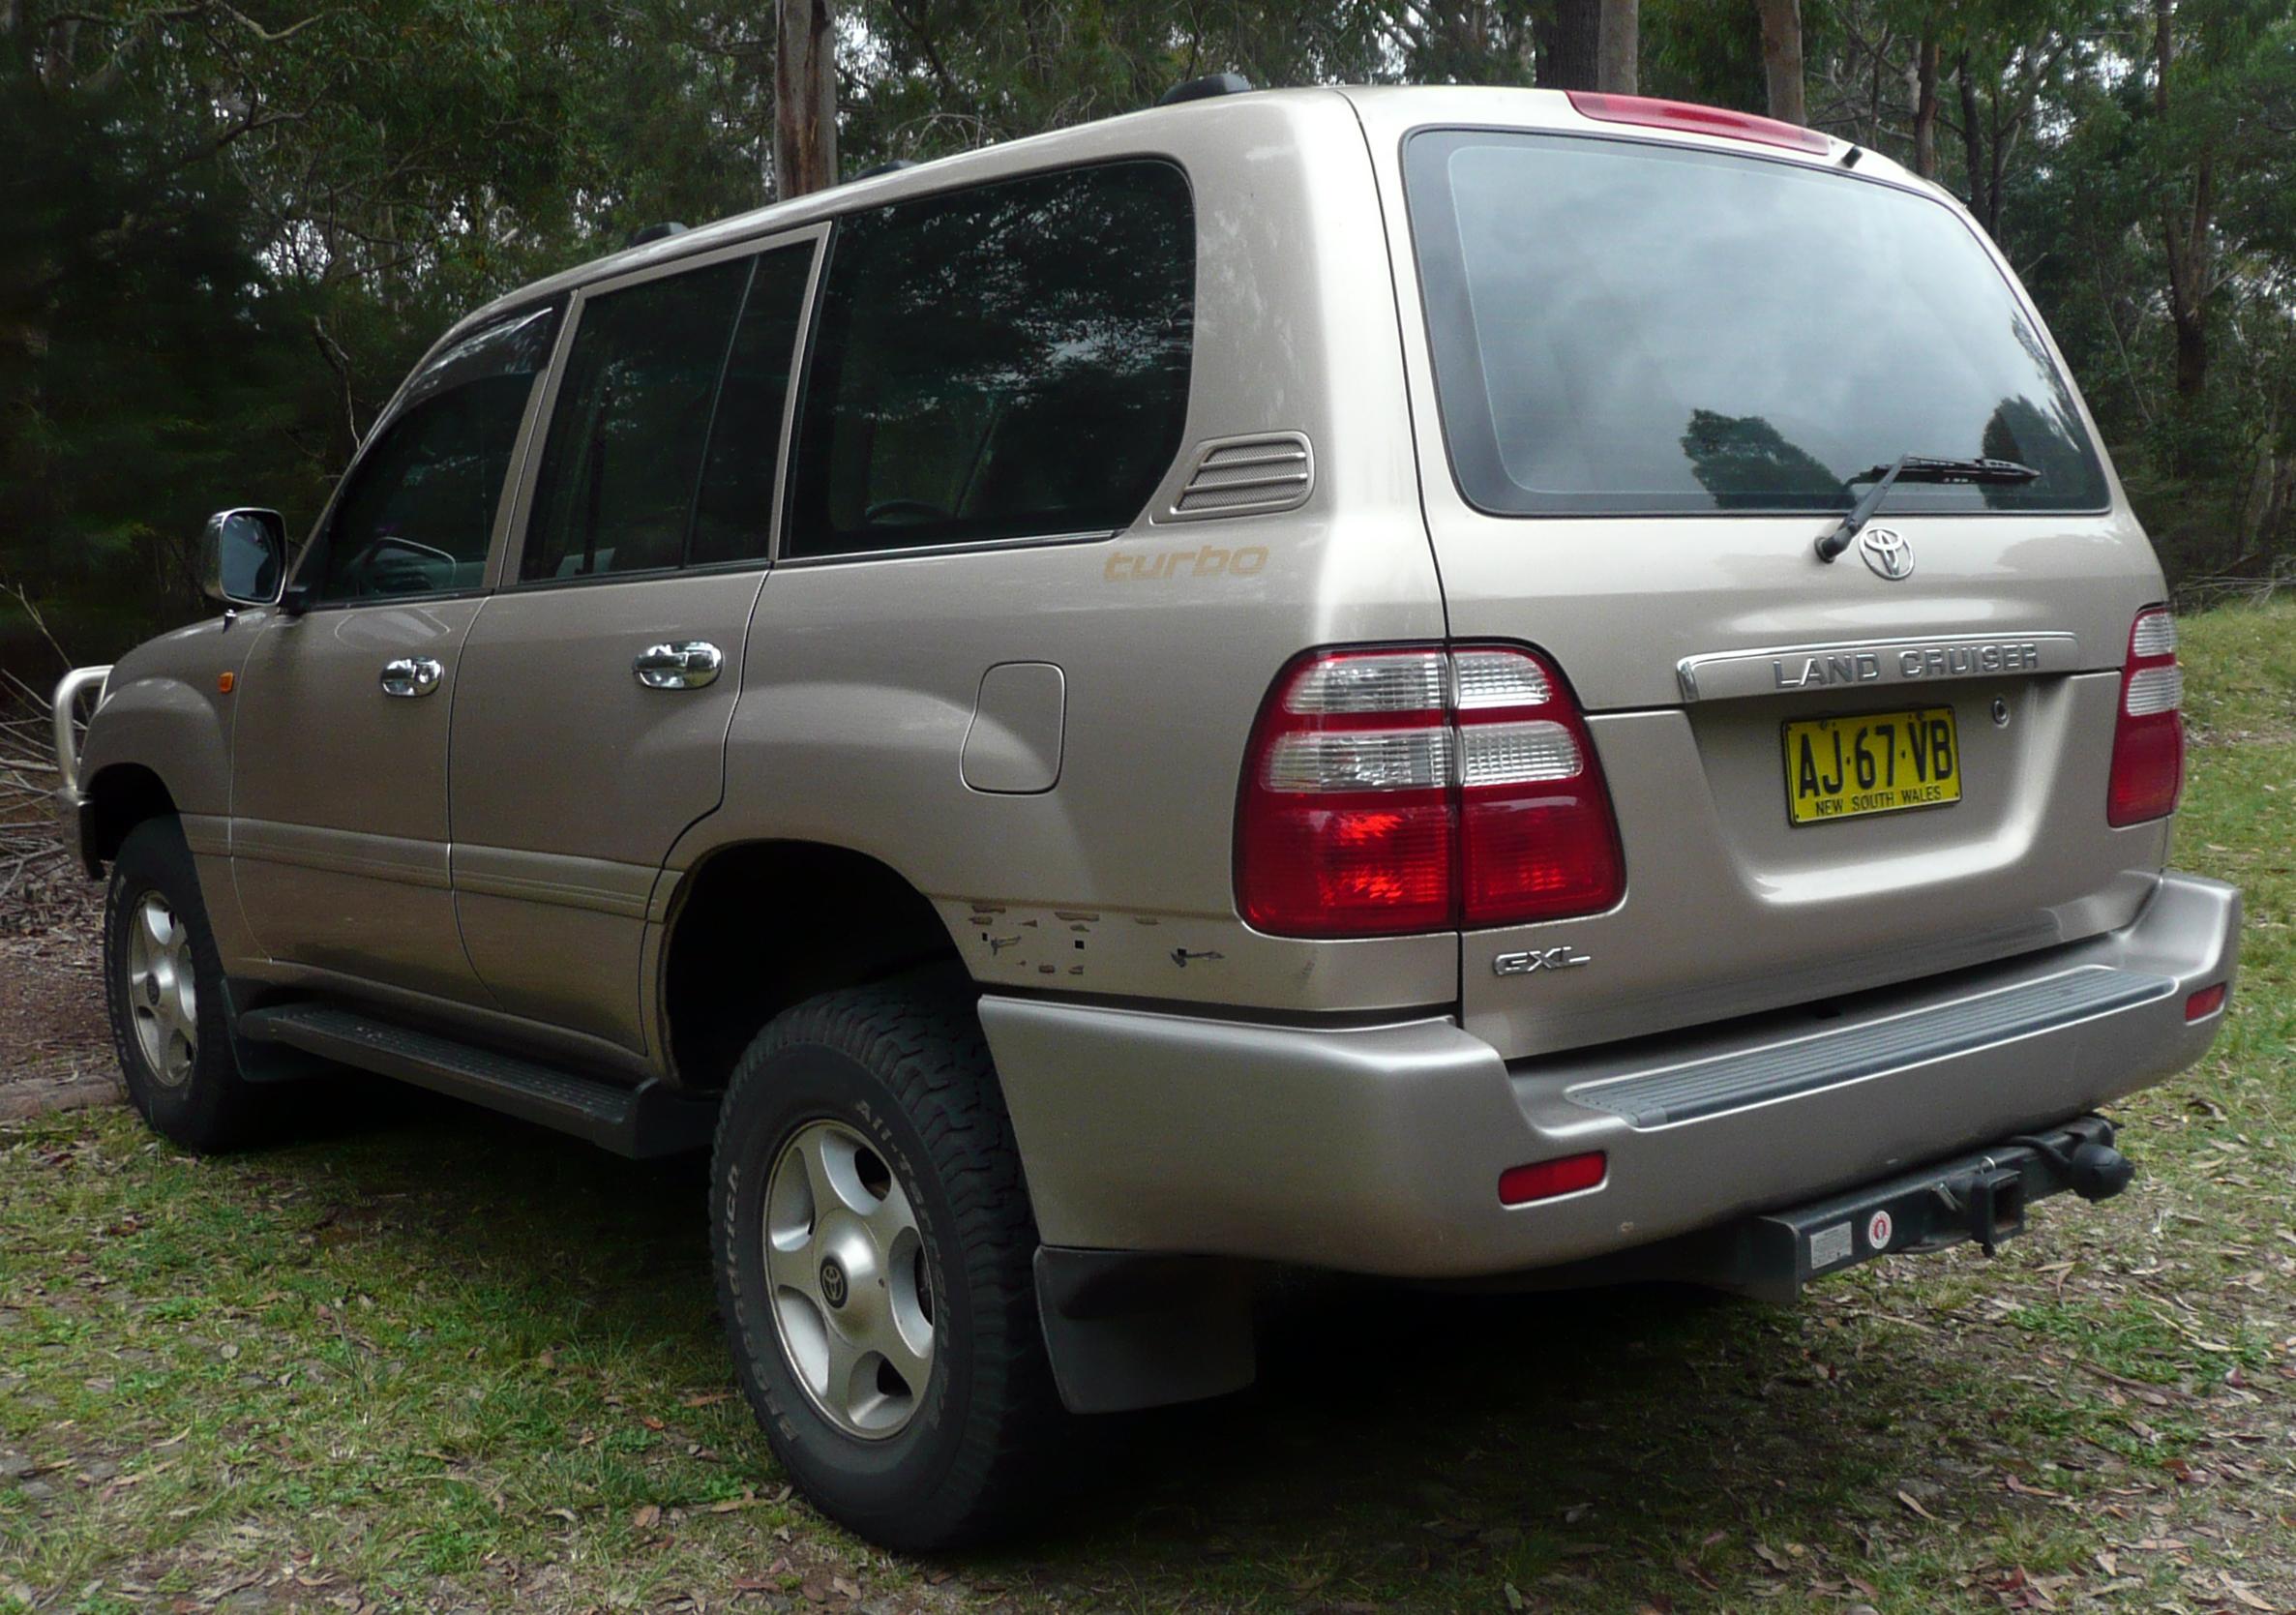 Toyota Land Cruiser Wiki >> File:2002-2005 Toyota Land Cruiser (HDJ100R) GXL 01.jpg - Wikimedia Commons